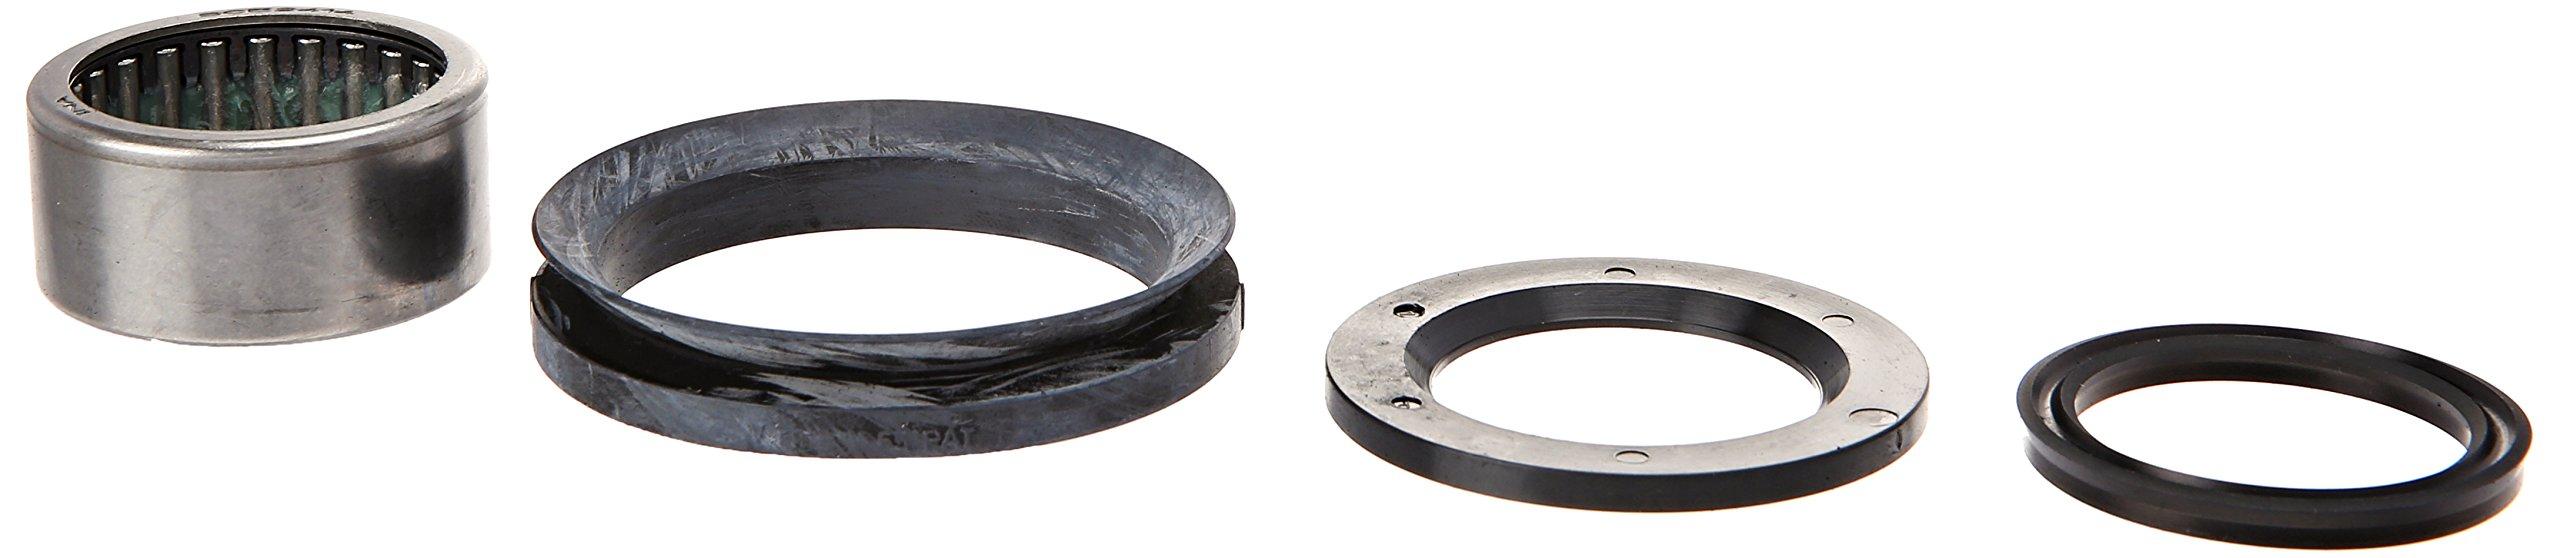 Yukon Gear & Axle YSPSP-024 Spindle Bearing/Seal Kit; Dana 50/Dana 60; Front;